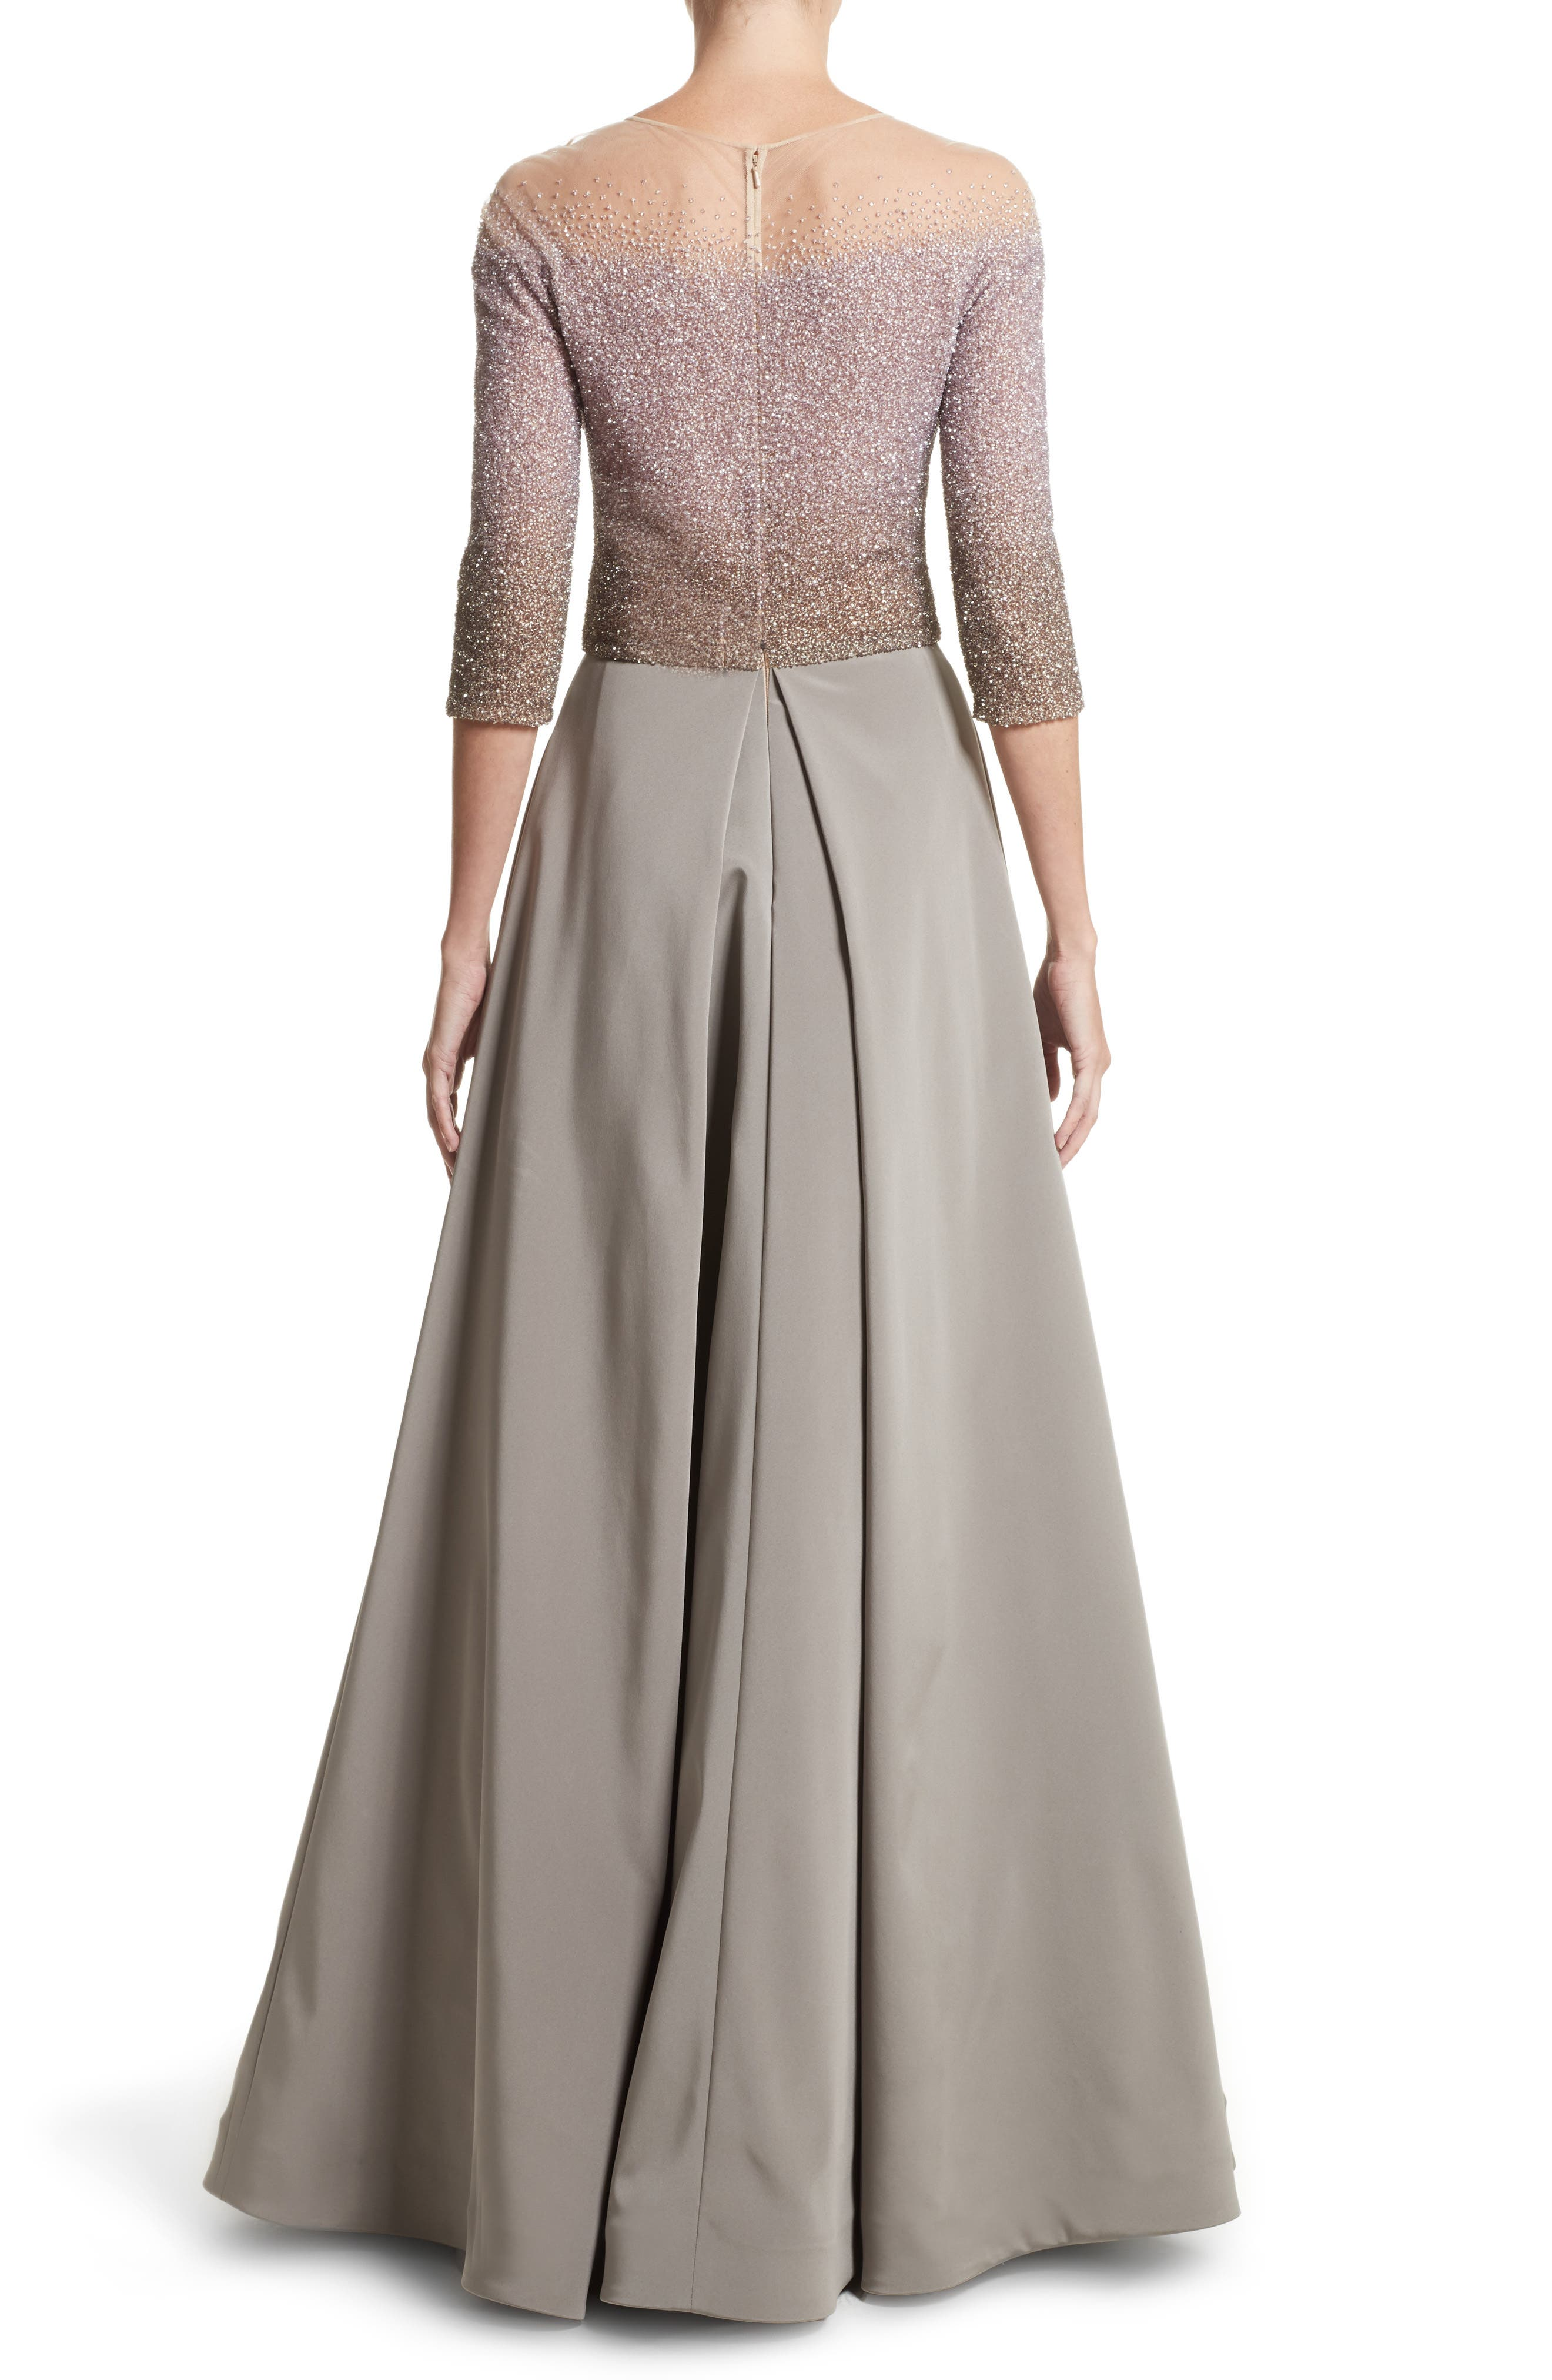 Illusion Sequin & Faille A-Line Gown,                             Alternate thumbnail 2, color,                             244